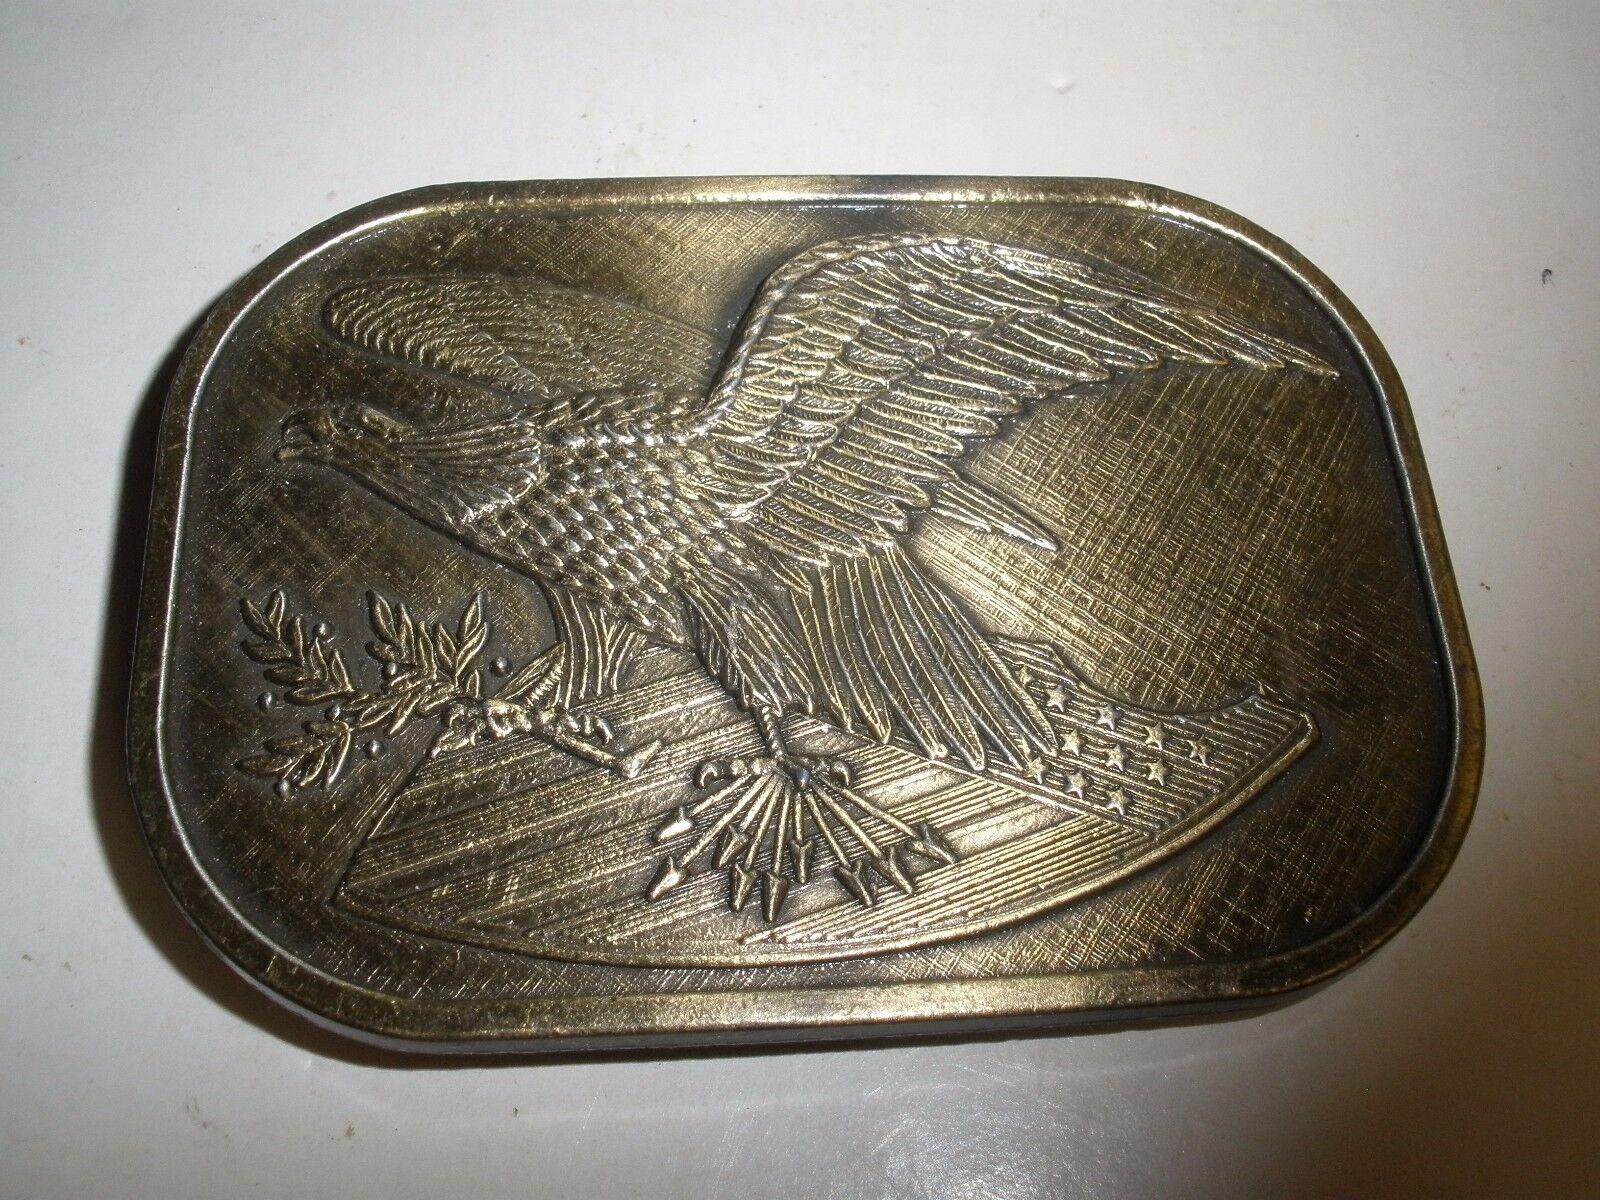 200TH ANNIVERSARY AMERICAN EAGLE BELT BUCKLE BRONZE TONE 17507